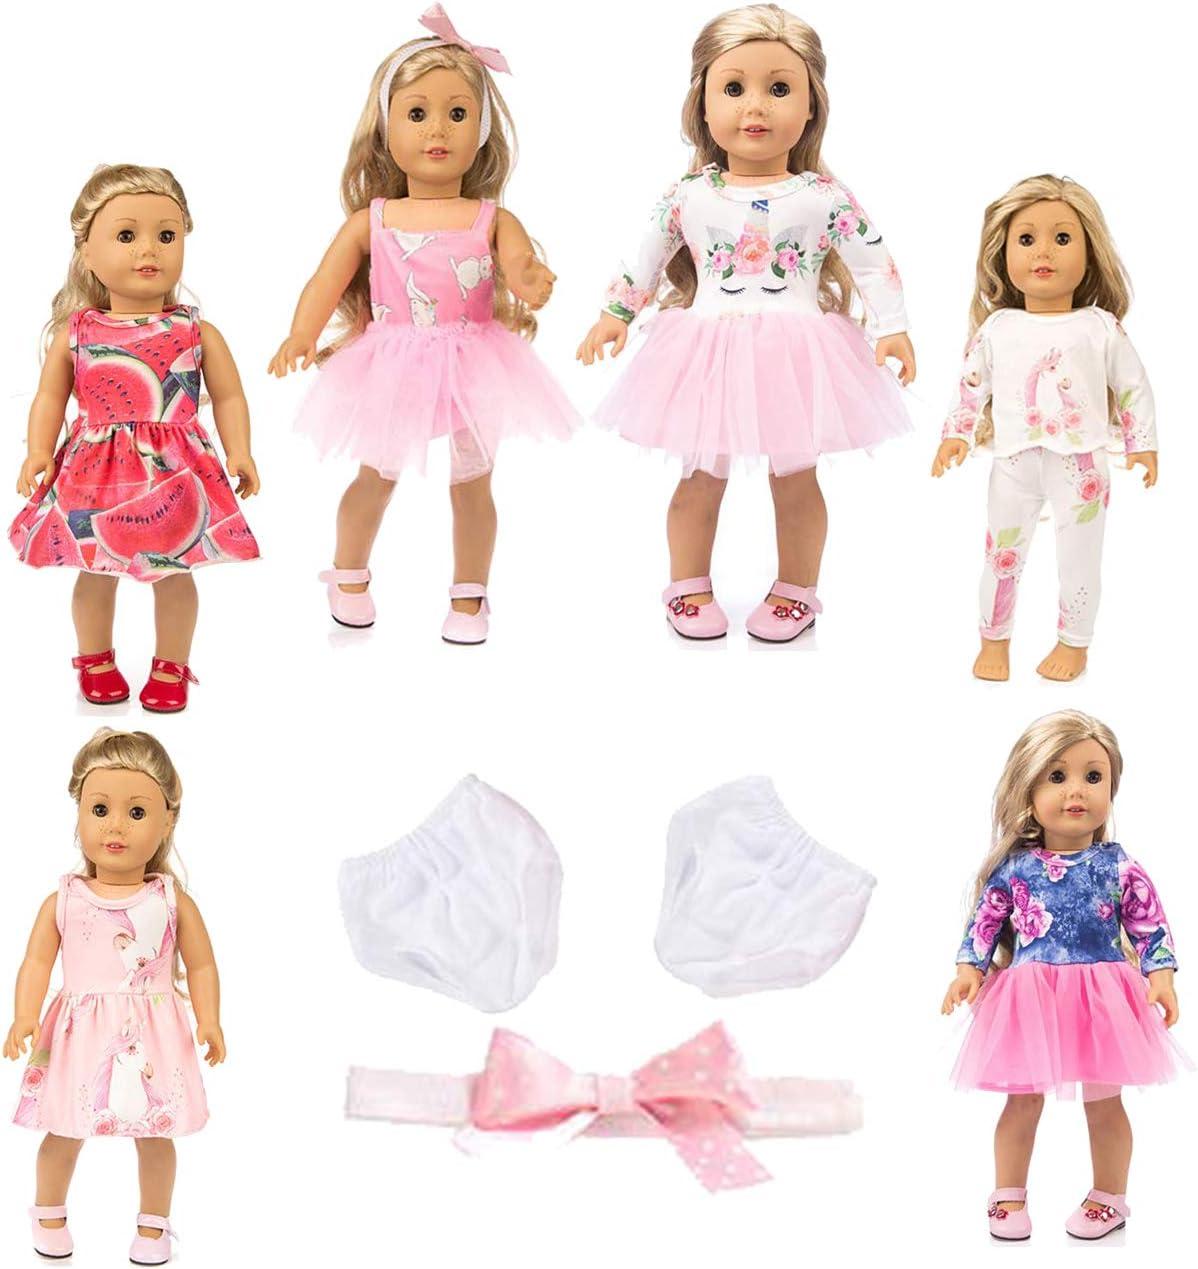 axxxt 11PC American girsl Doll Unicorn Doll American girsl Unicorn Doll Accessories Outfits Fits 18